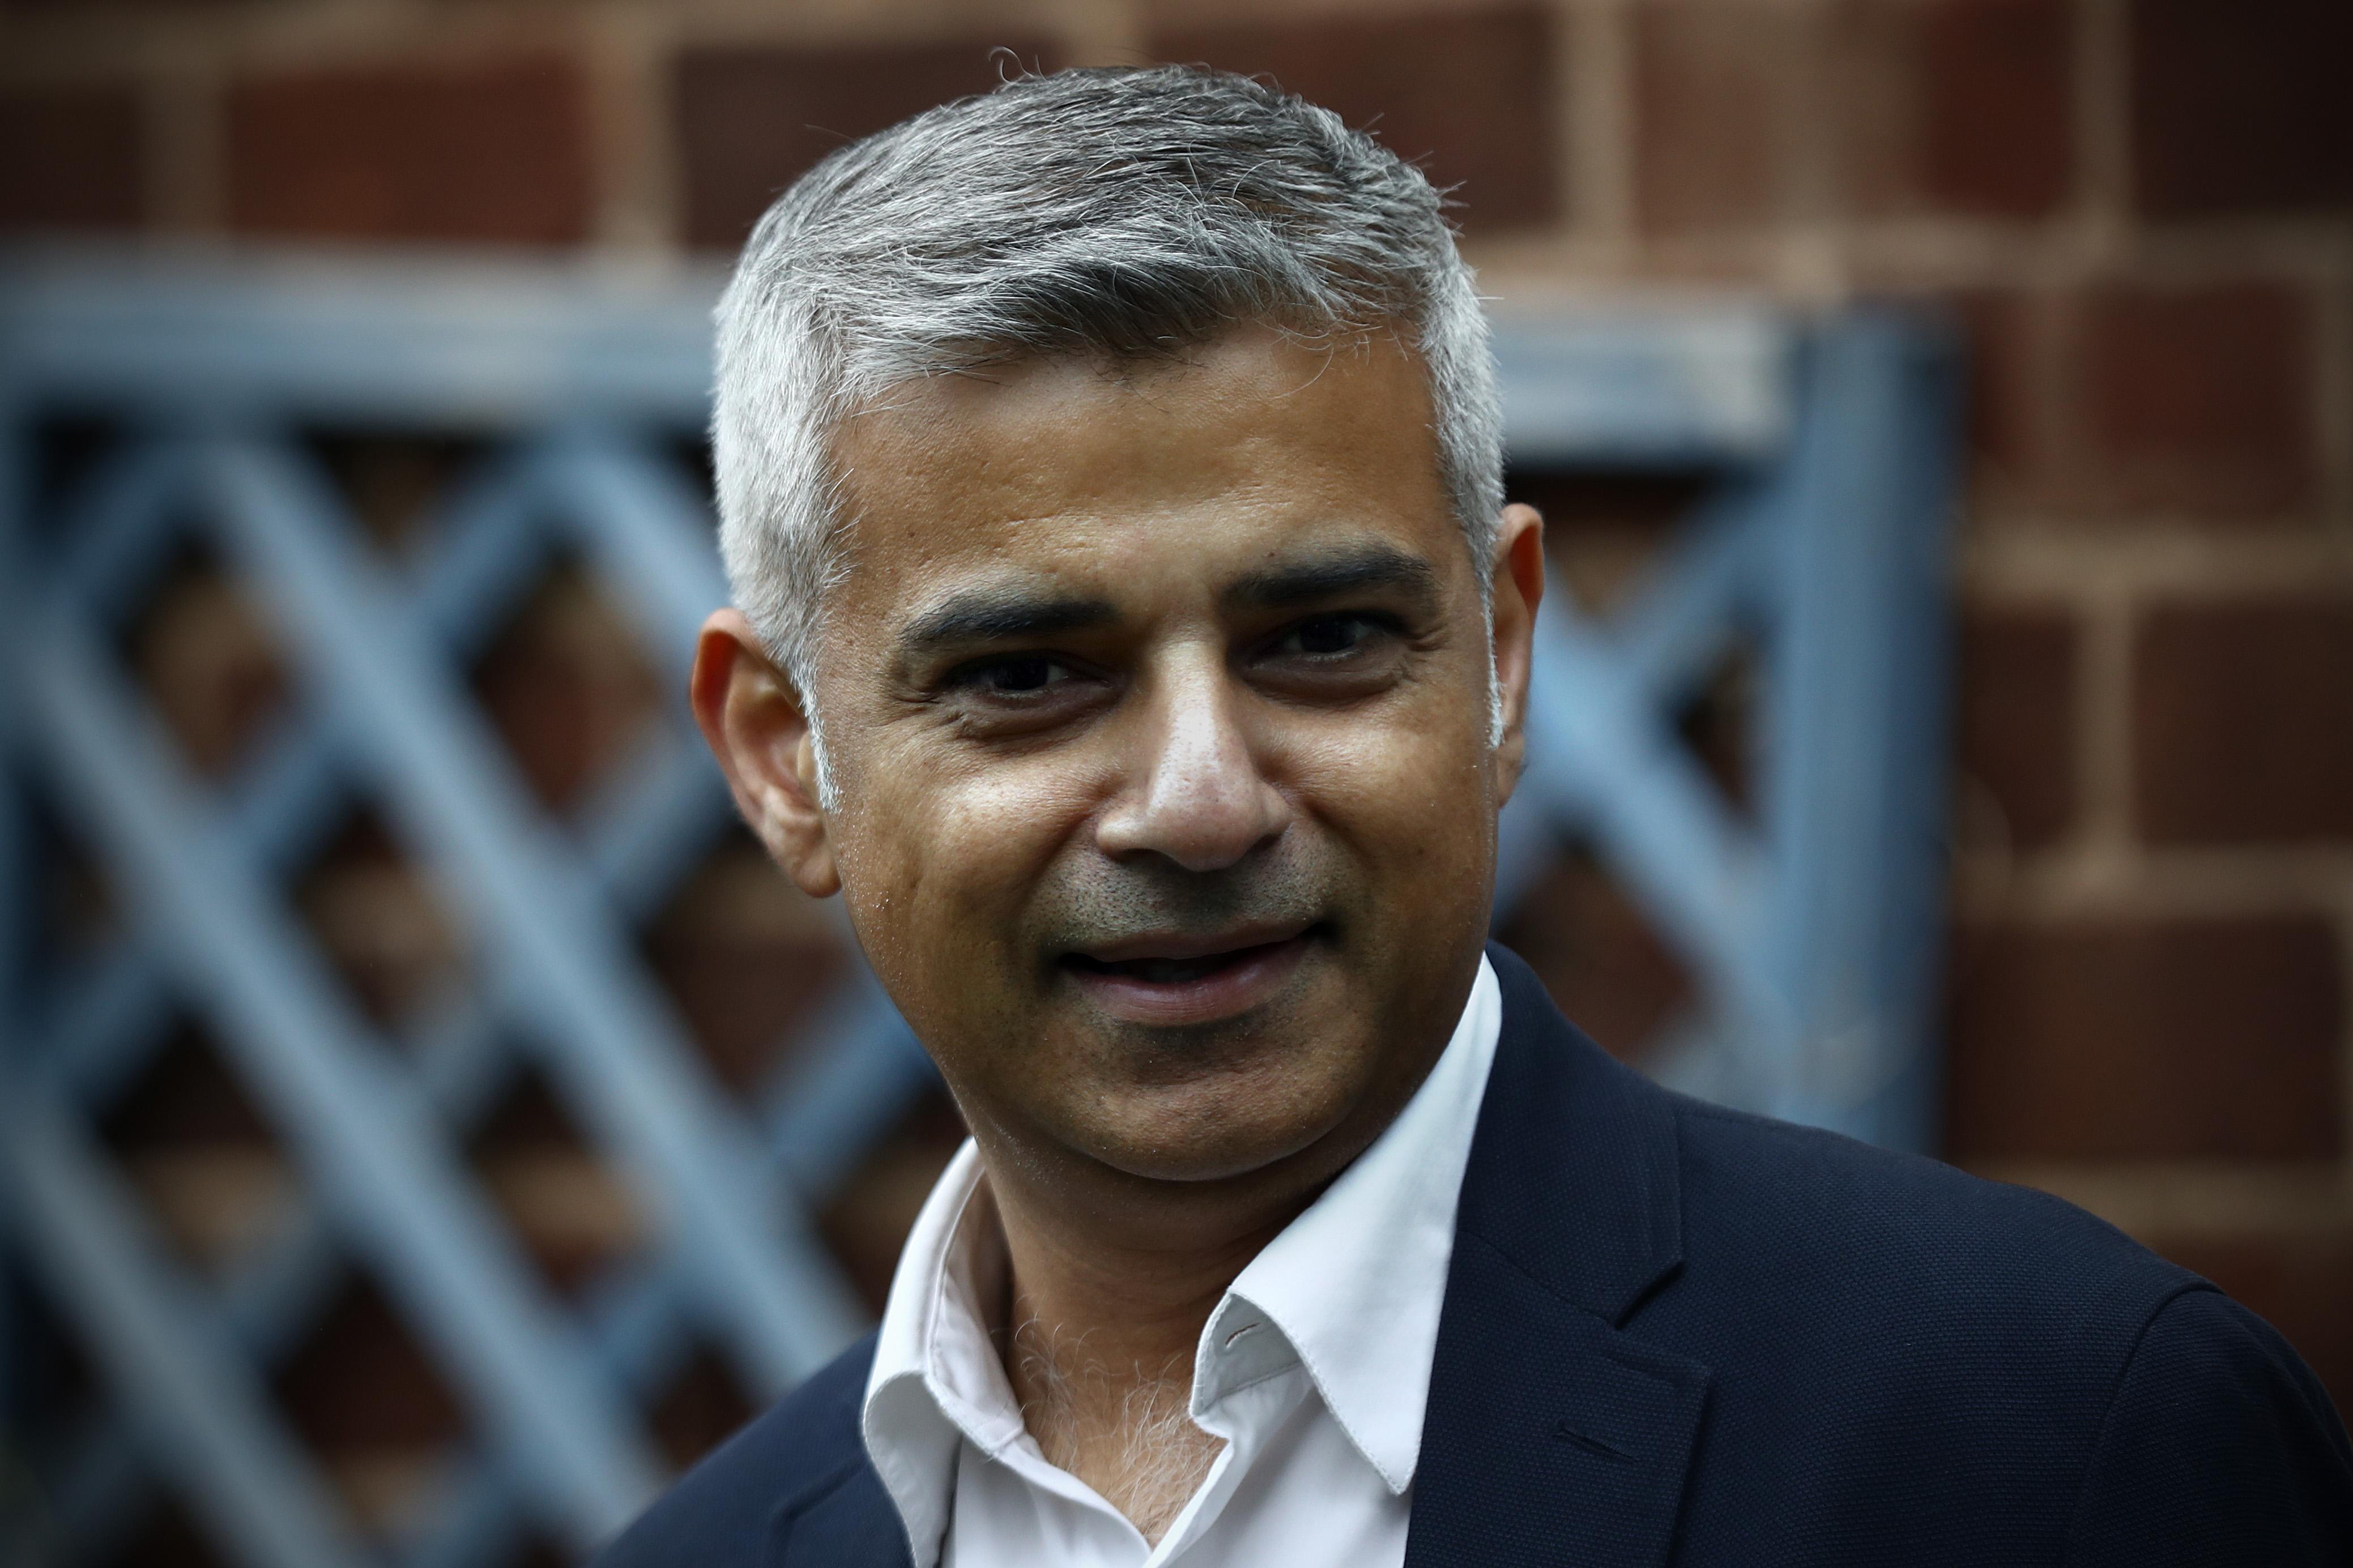 London Mayor Sadiq Khan Launches Volunteer Week